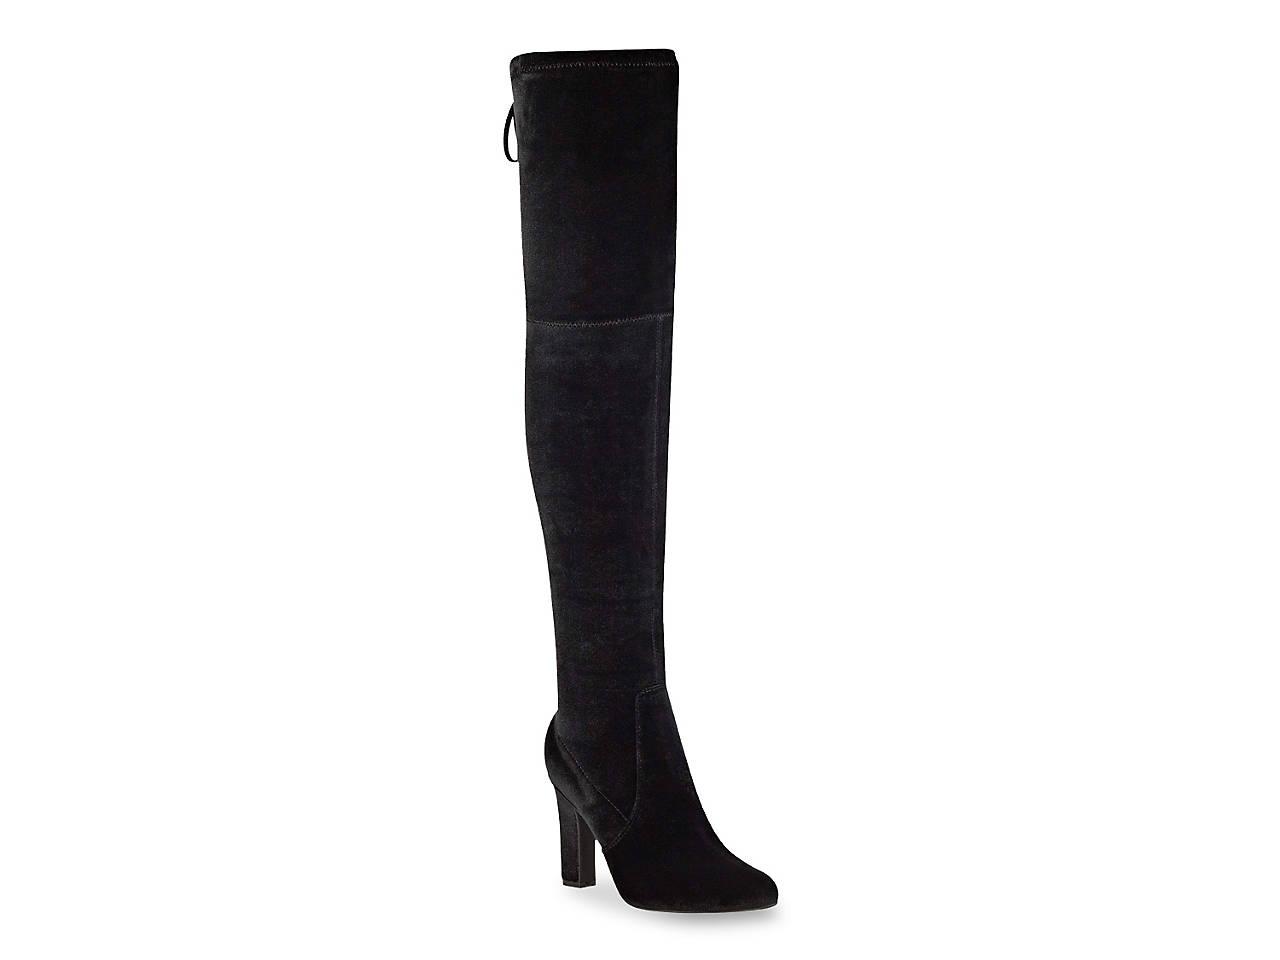 58a13cf44227 Unisa Saromi Over The Knee Velvet Boot Women s Shoes